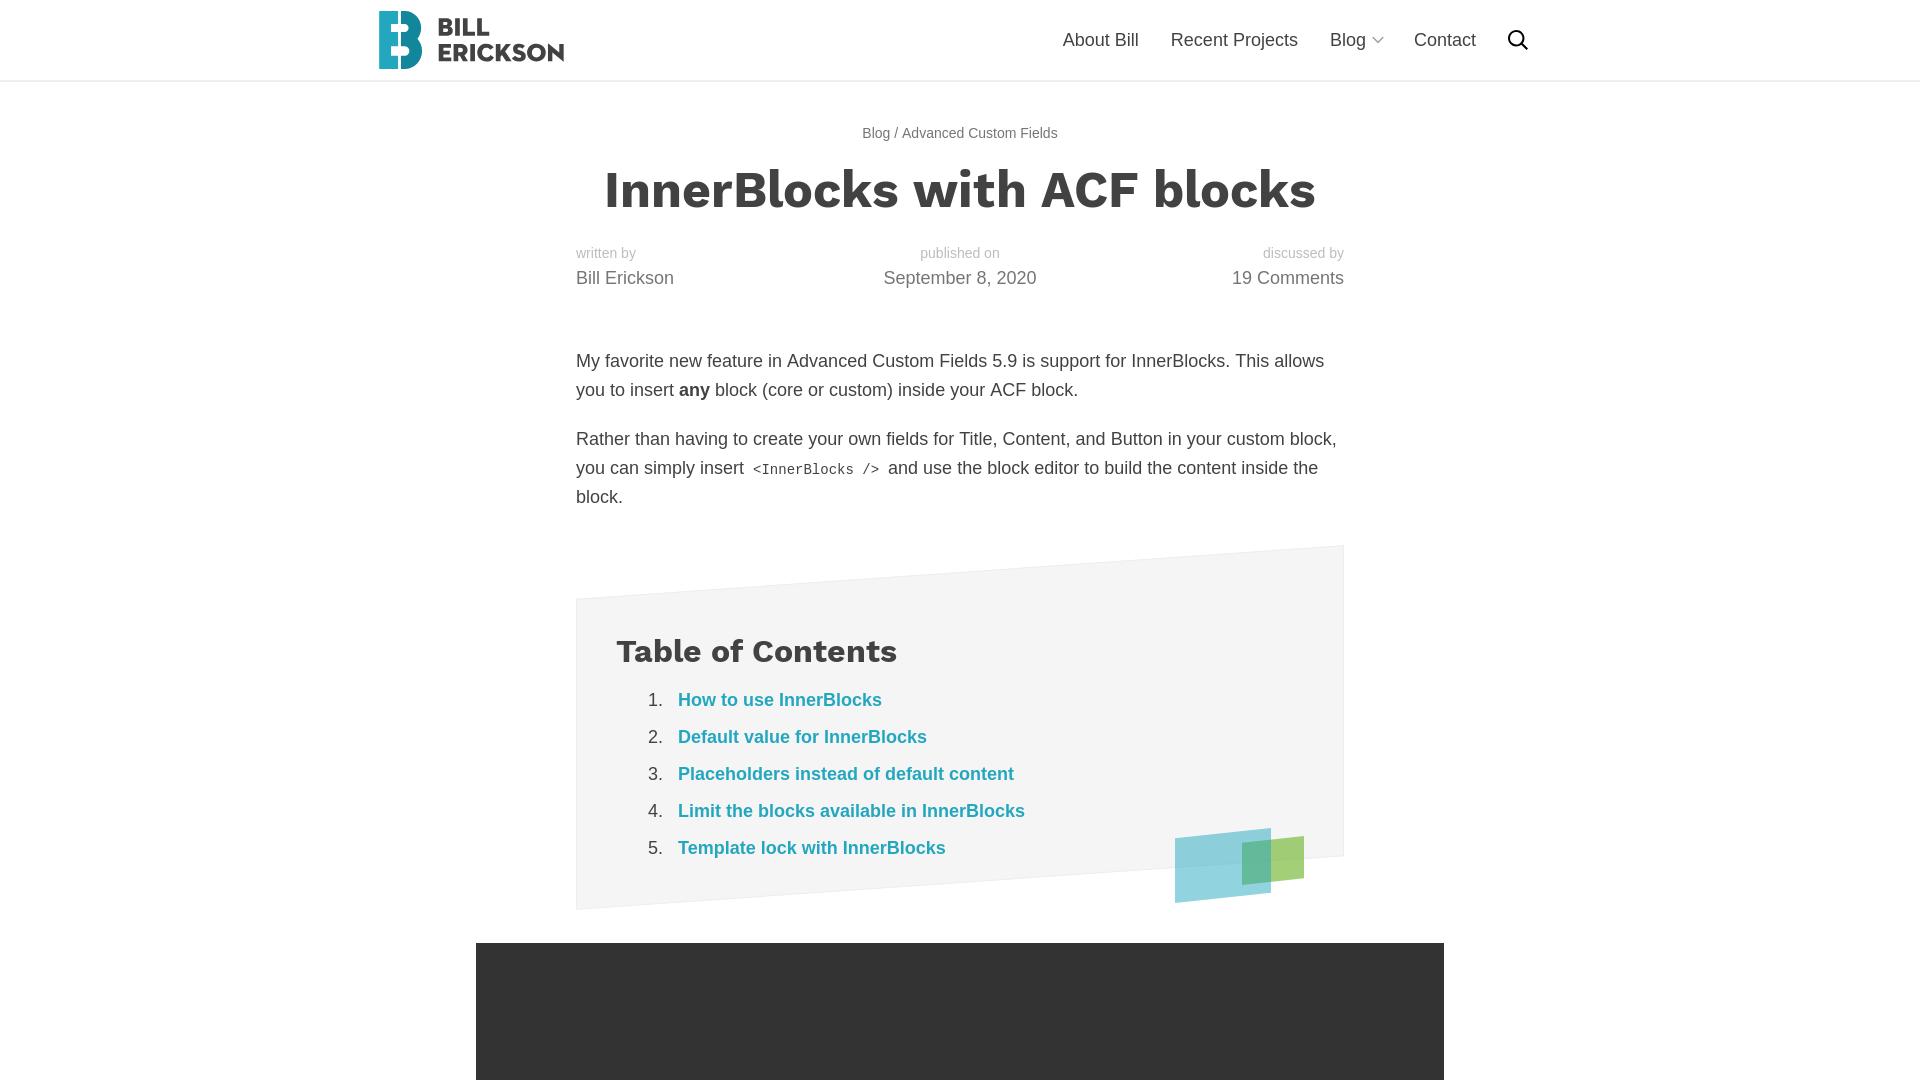 https://www.billerickson.net/innerblocks-with-acf-blocks/